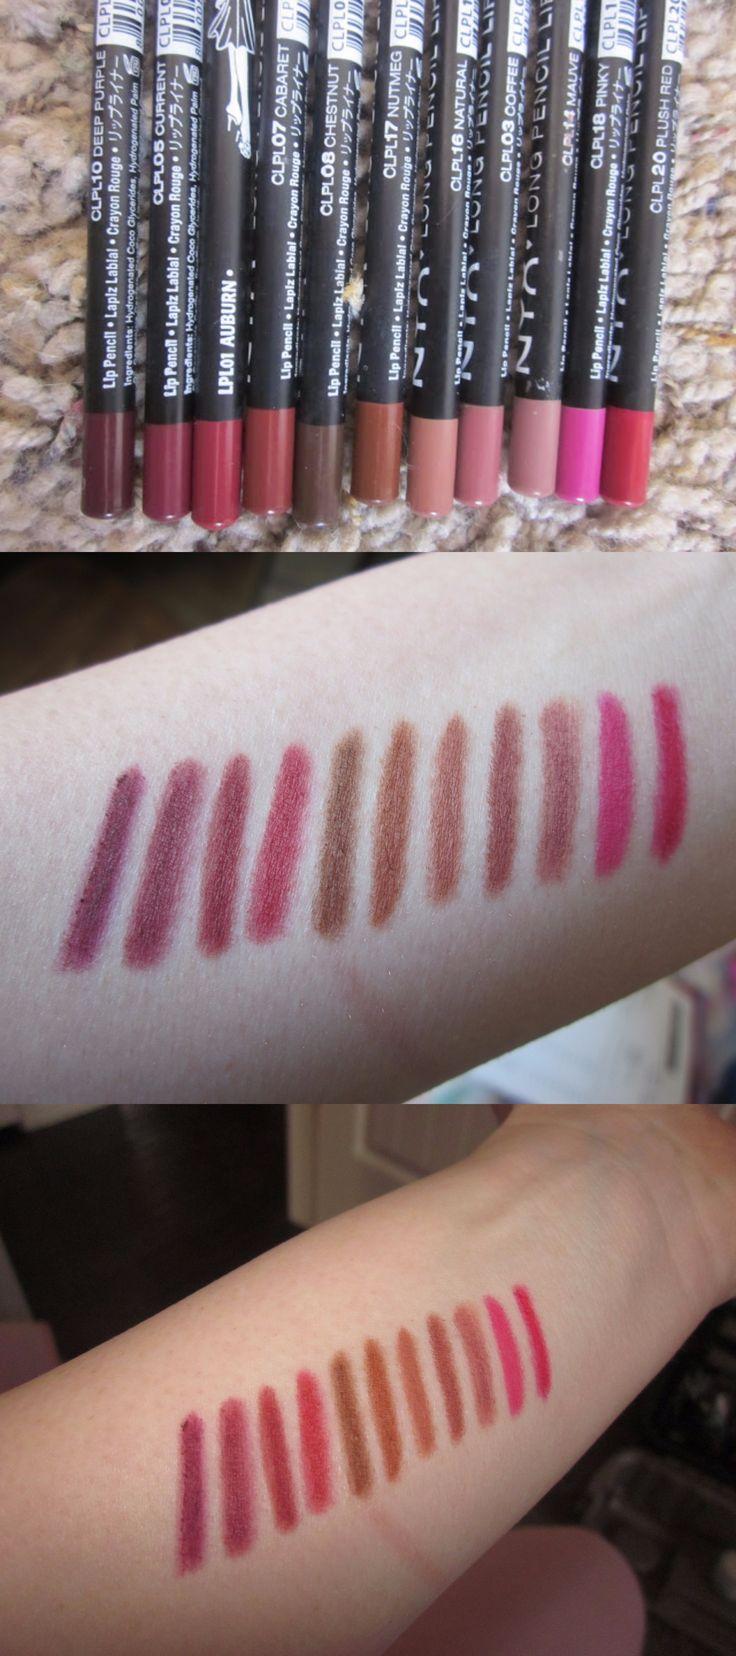 NYX Lip Liner Pencils: (L-R)  Deep Purple, Current, Auburn, Cabaret, Chestnut, Nutmeg, Natural, Coffee, Mauve, Pinky, and Plush Red